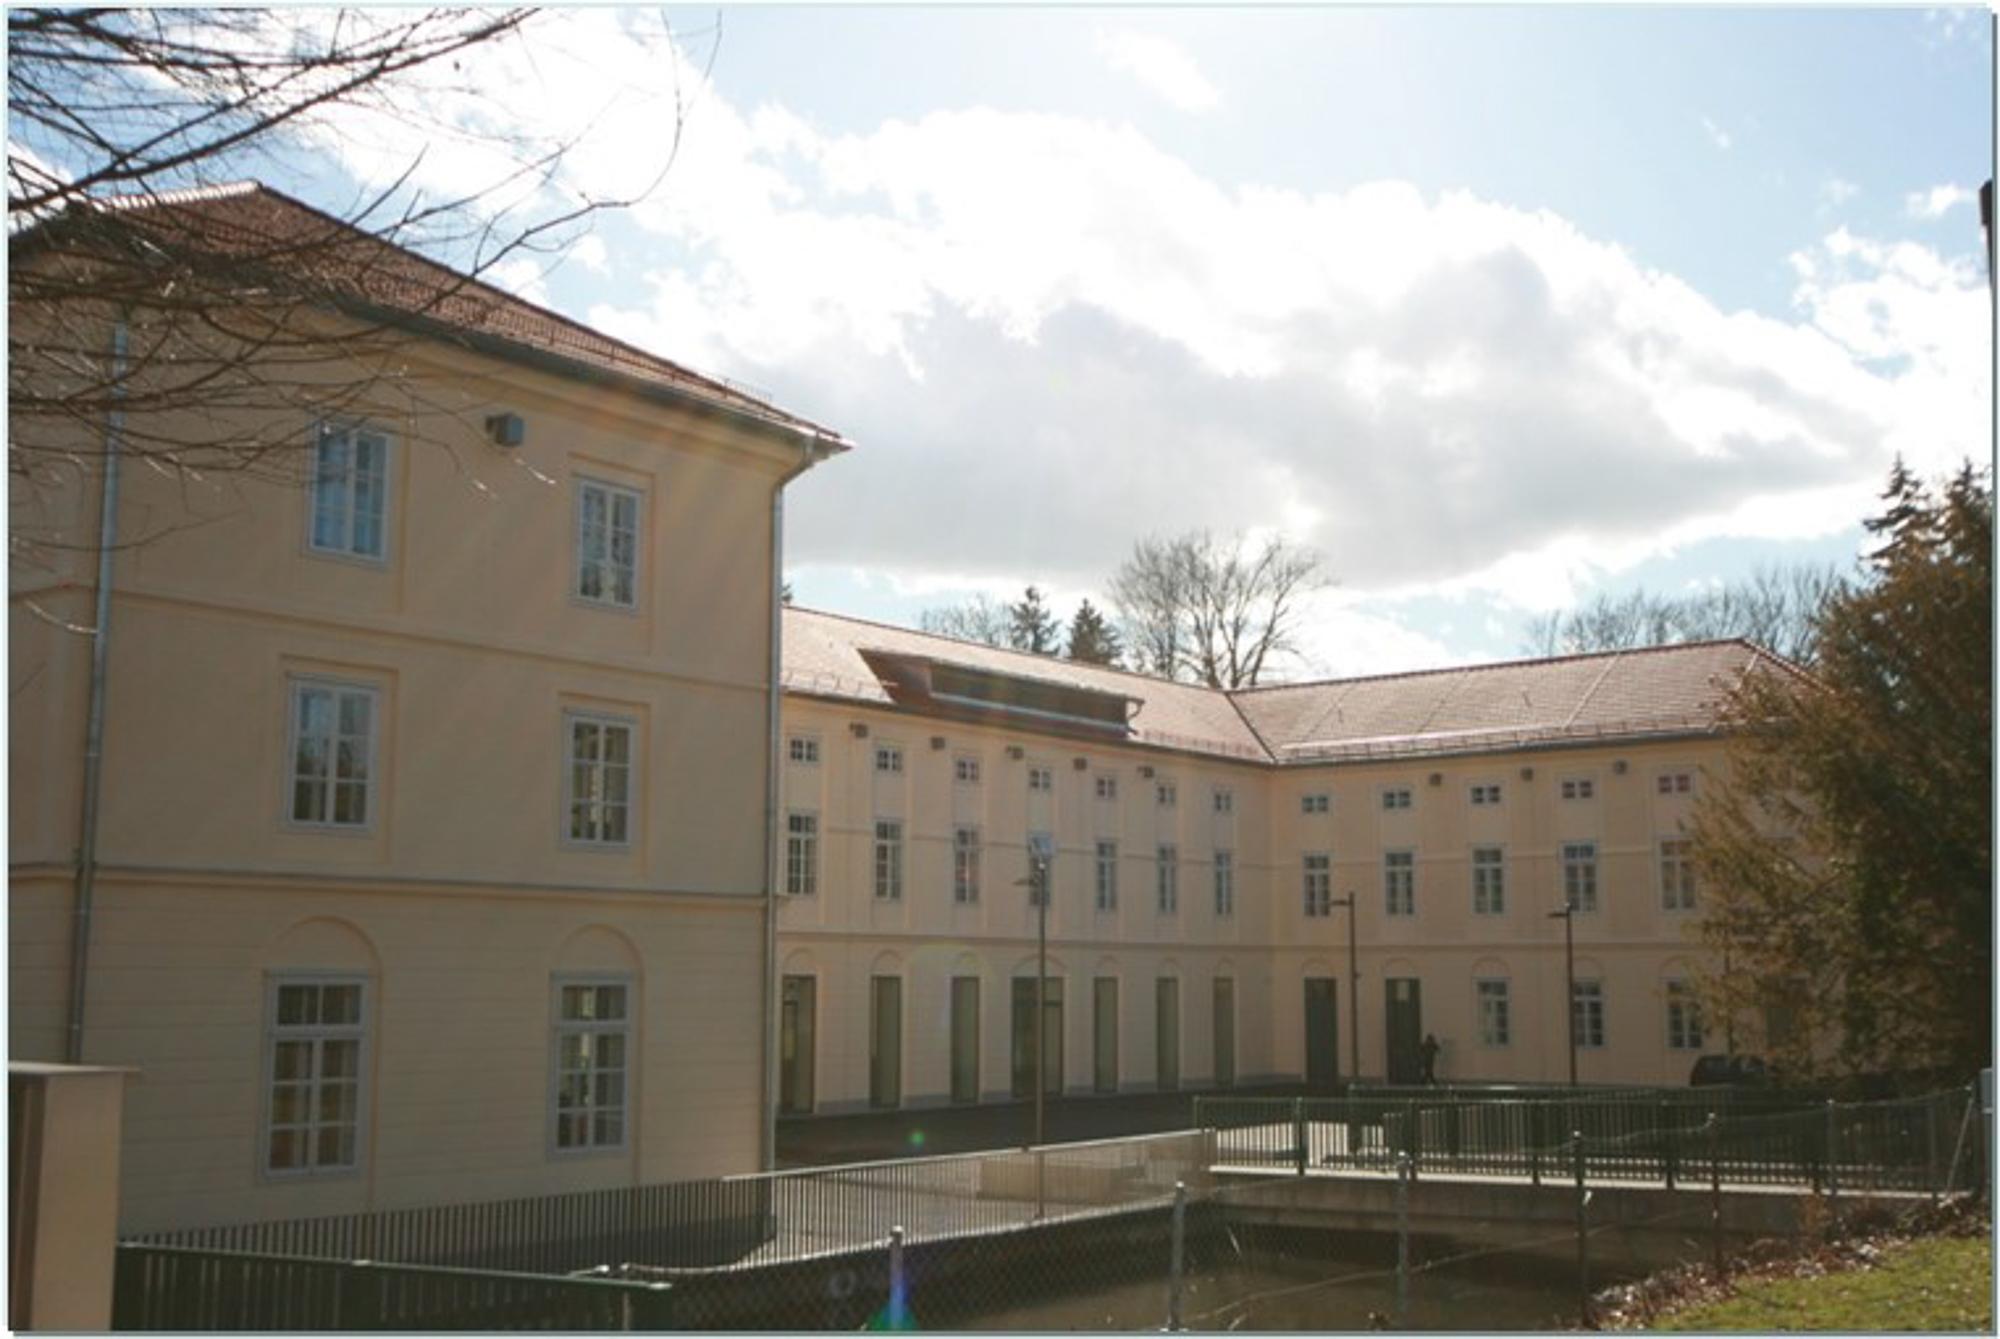 Herminenhof Wels